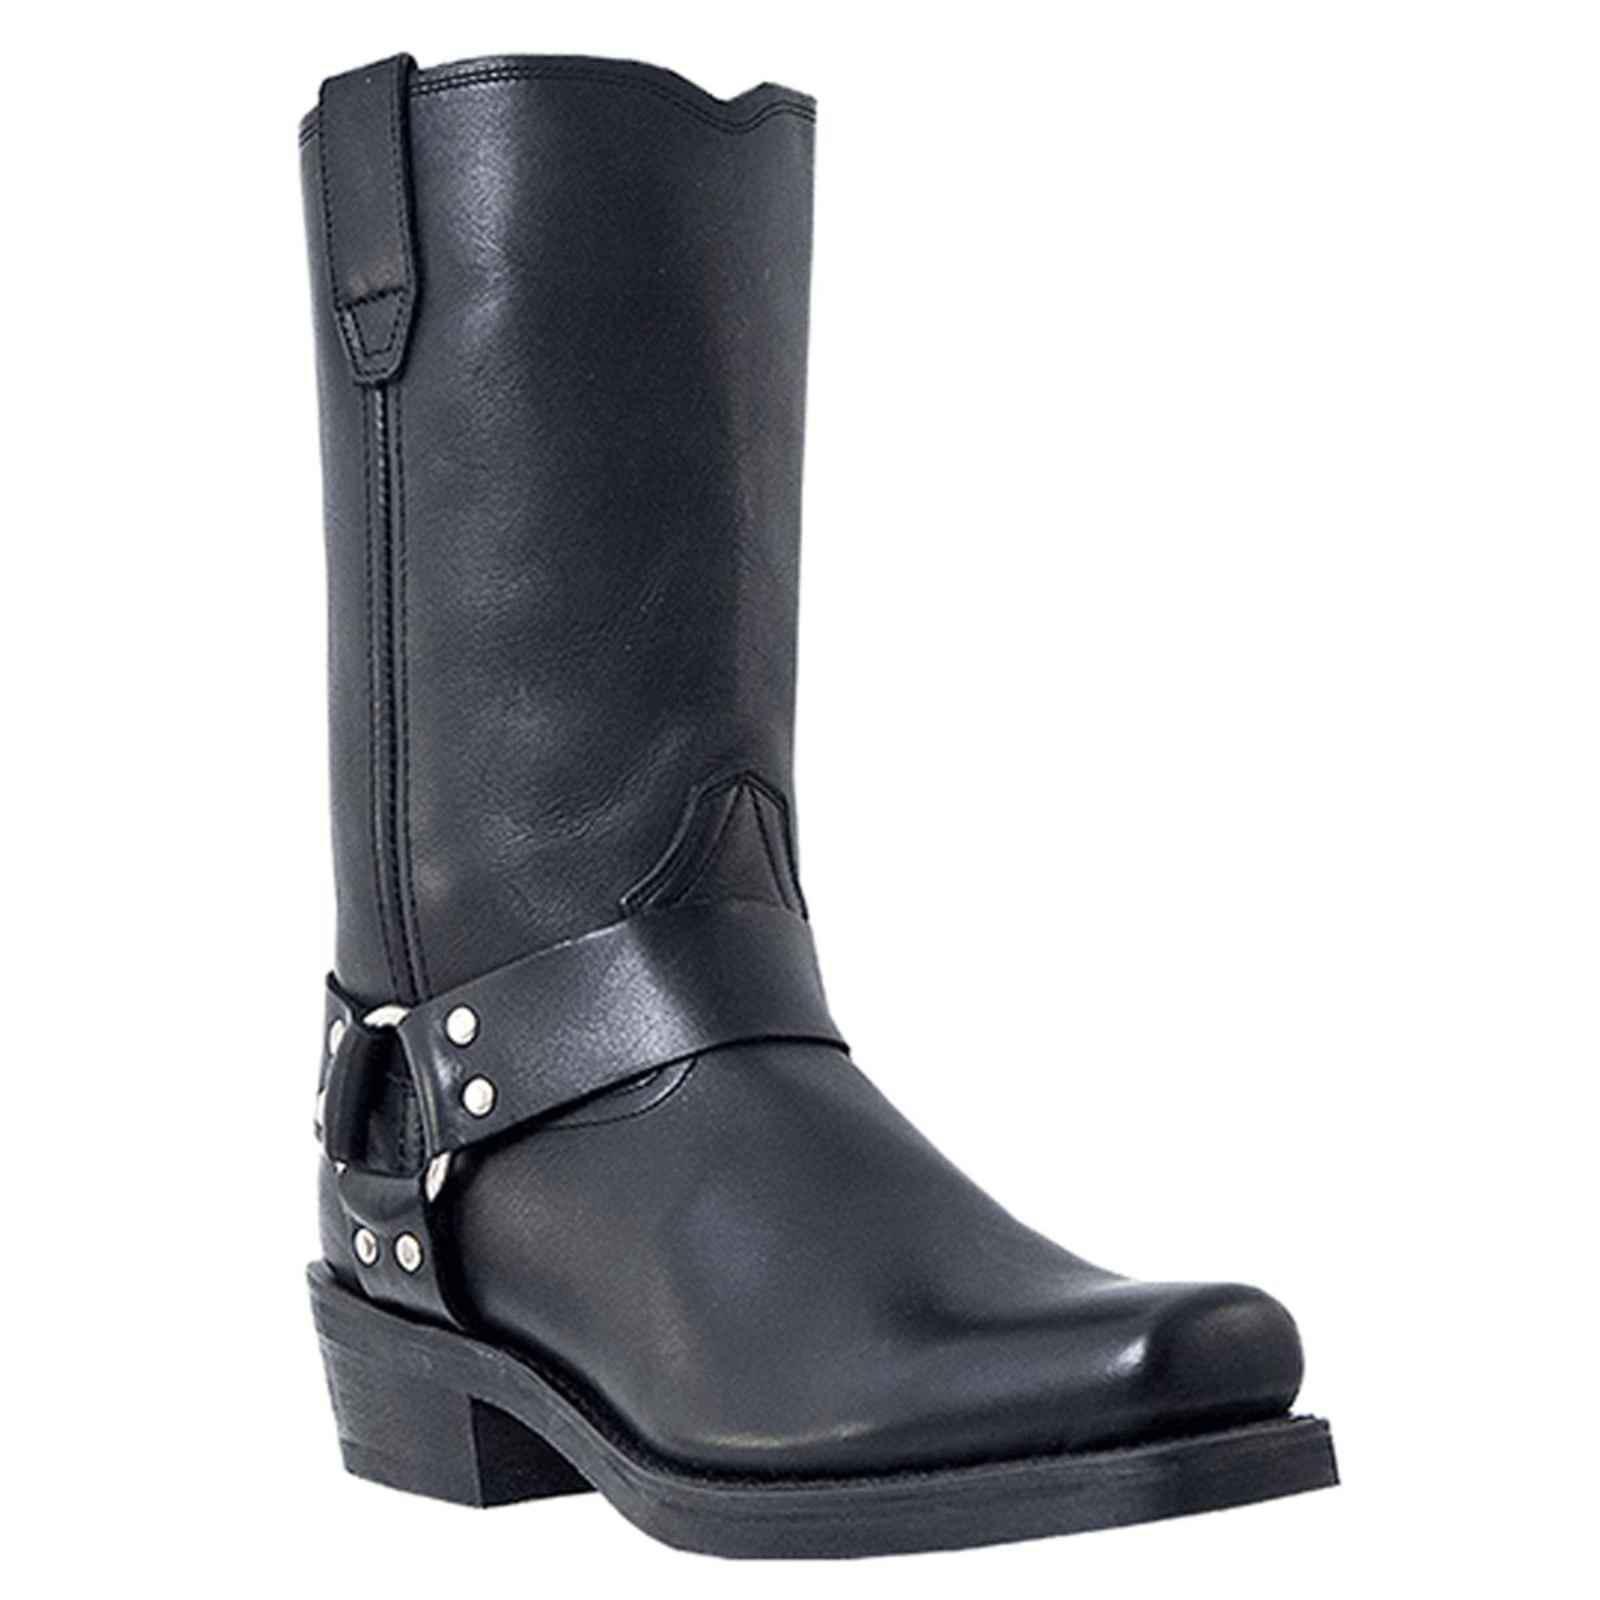 Dingo Men's Dean Boot Black, DI19057 by Dingo